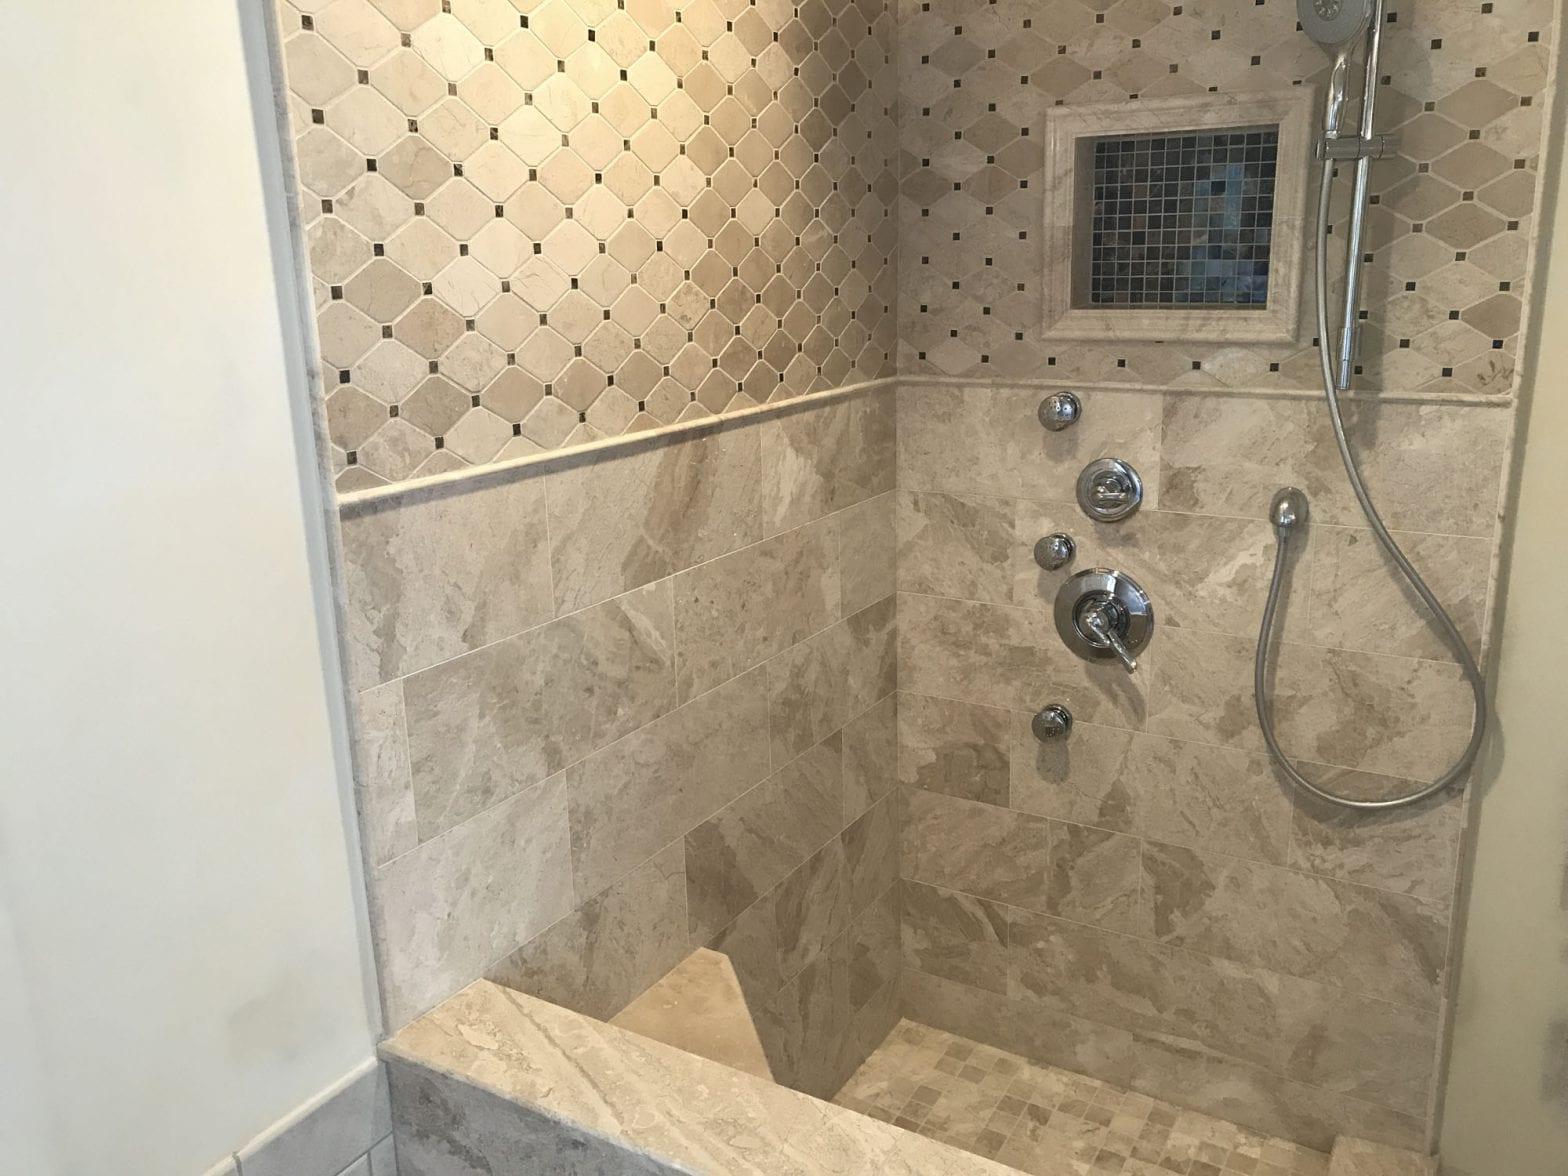 Shower Remodeling in Barrington IL - new tile